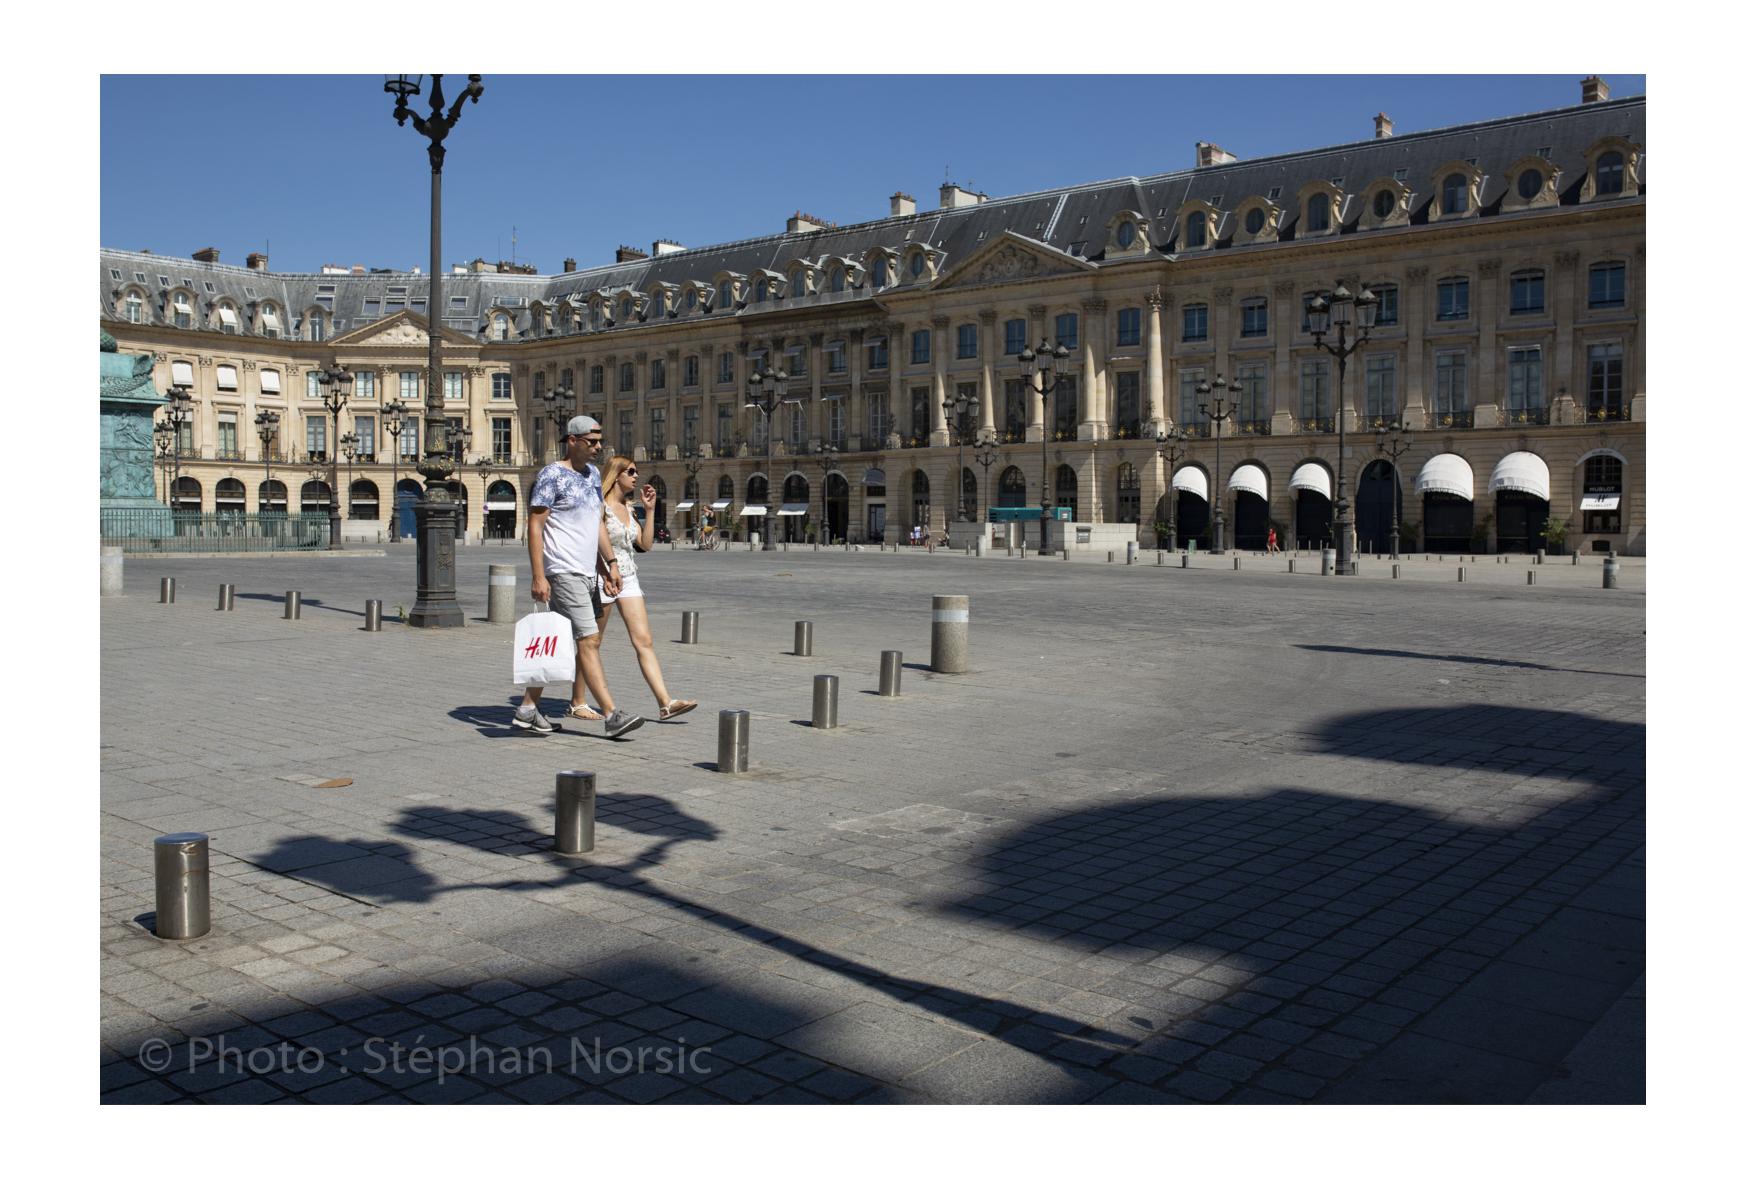 Stephan-Norsic-Paris-ok-1000-03